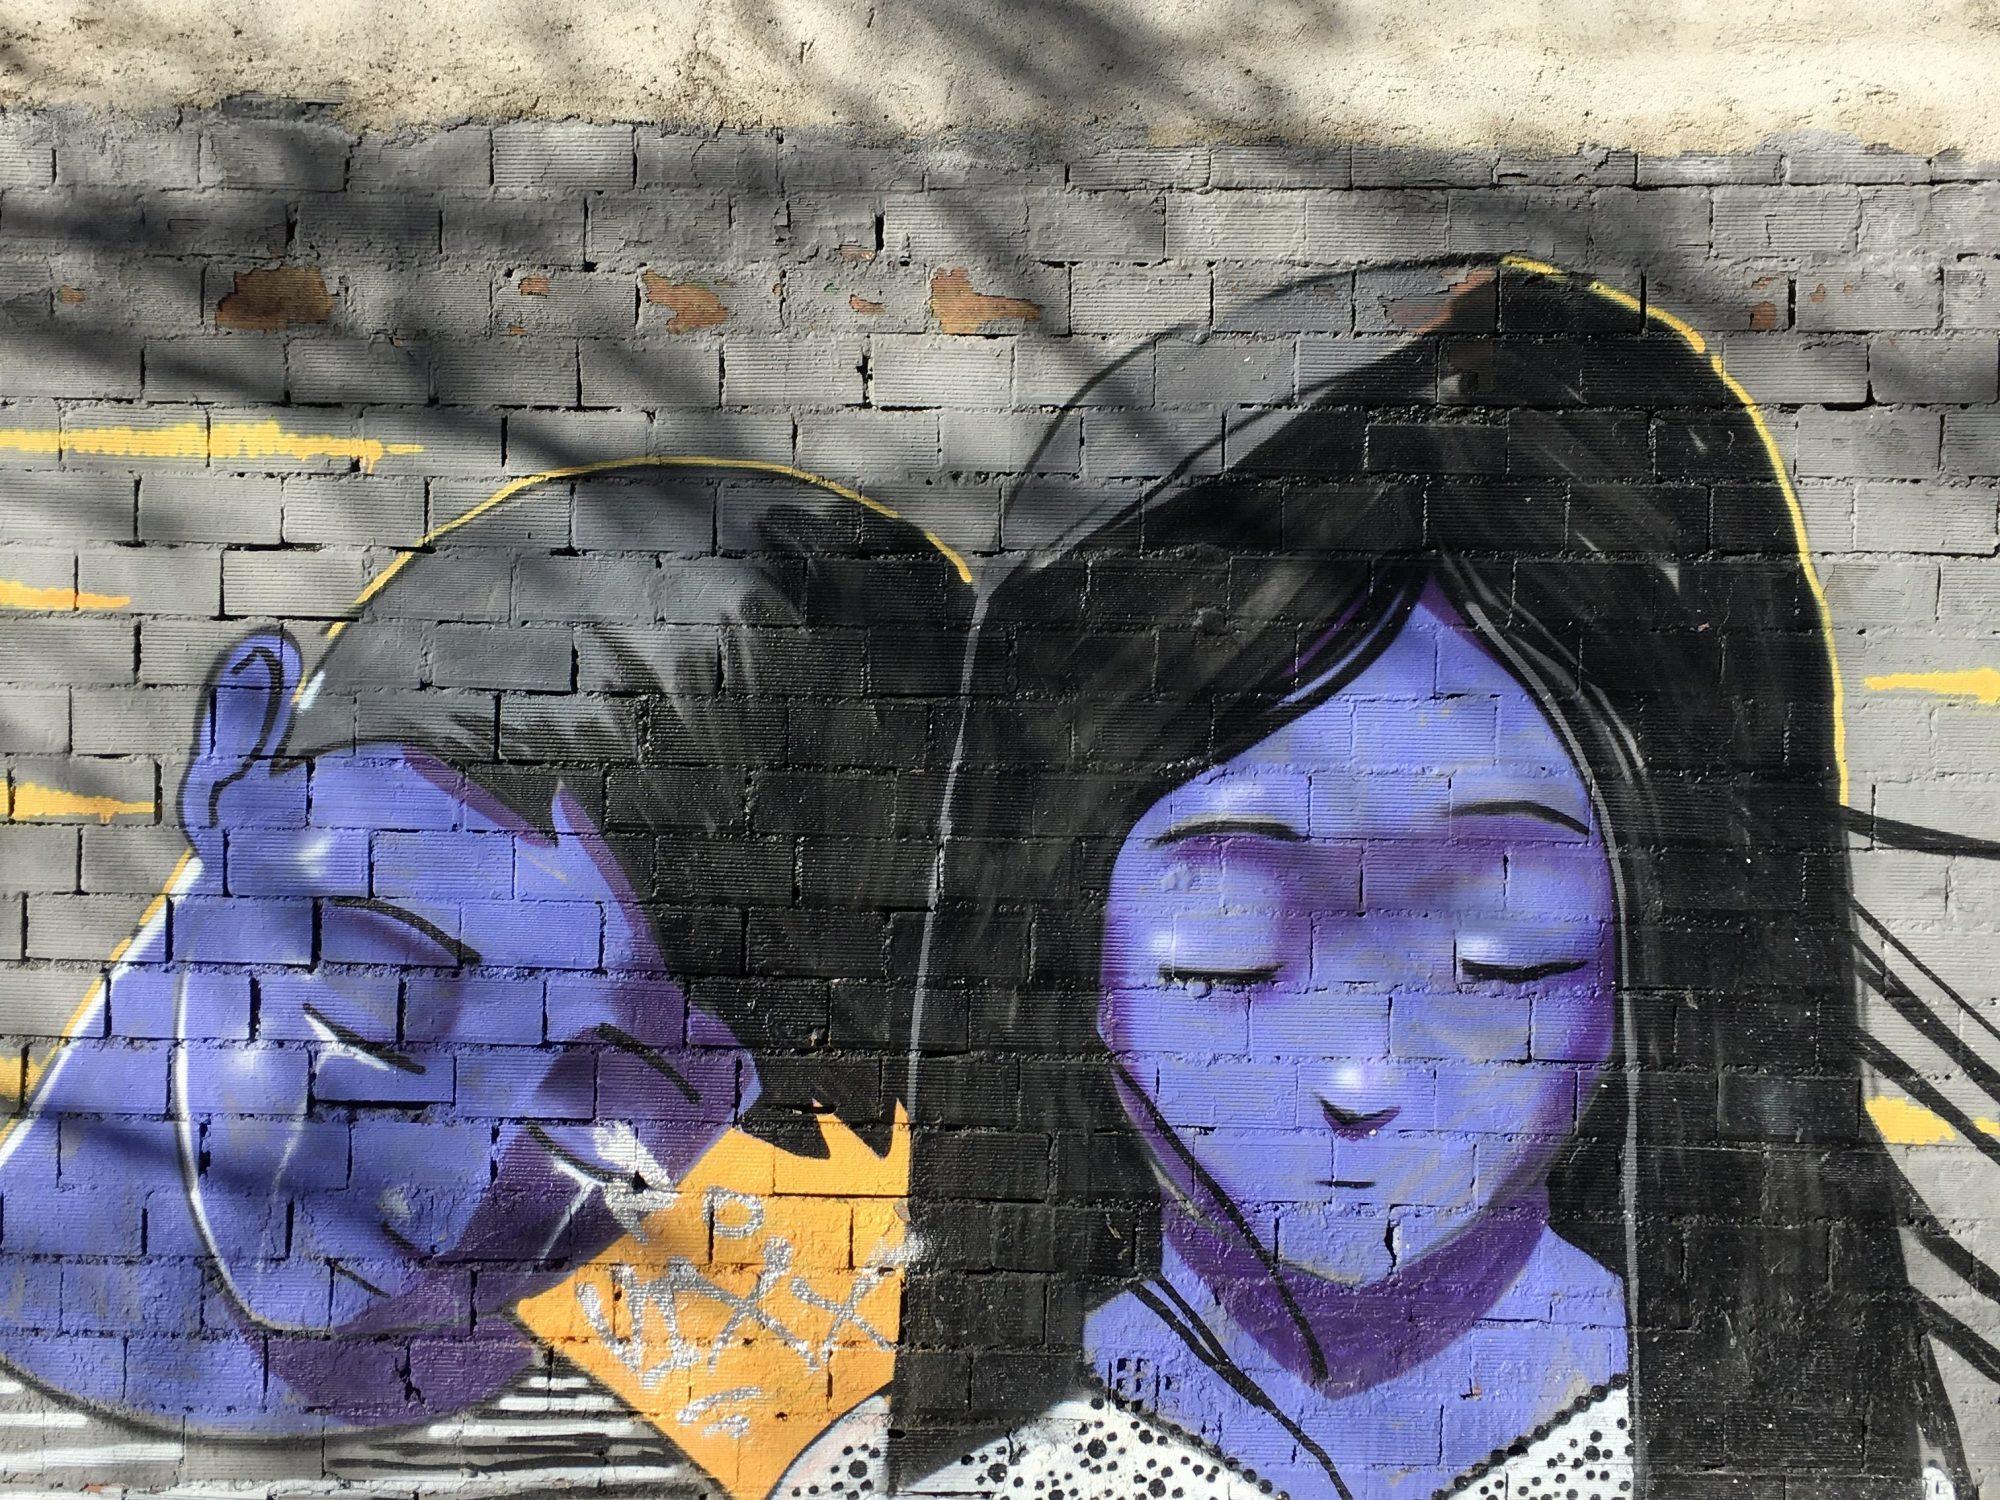 Graffitti of Girl and Boy in Madrid, near Atocha Station